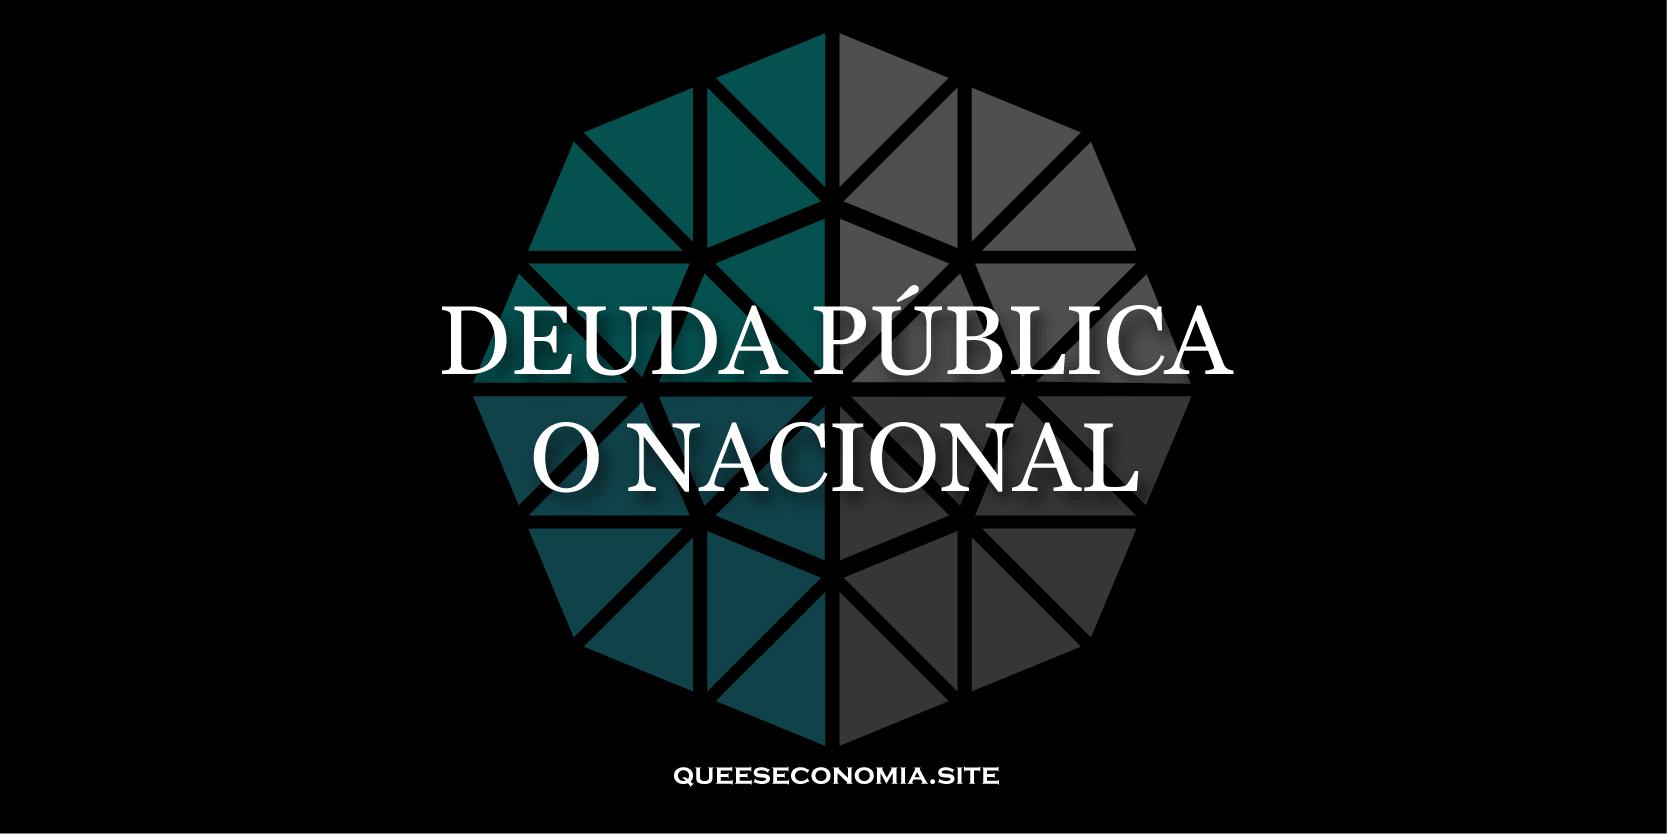 deuda pública o nacional